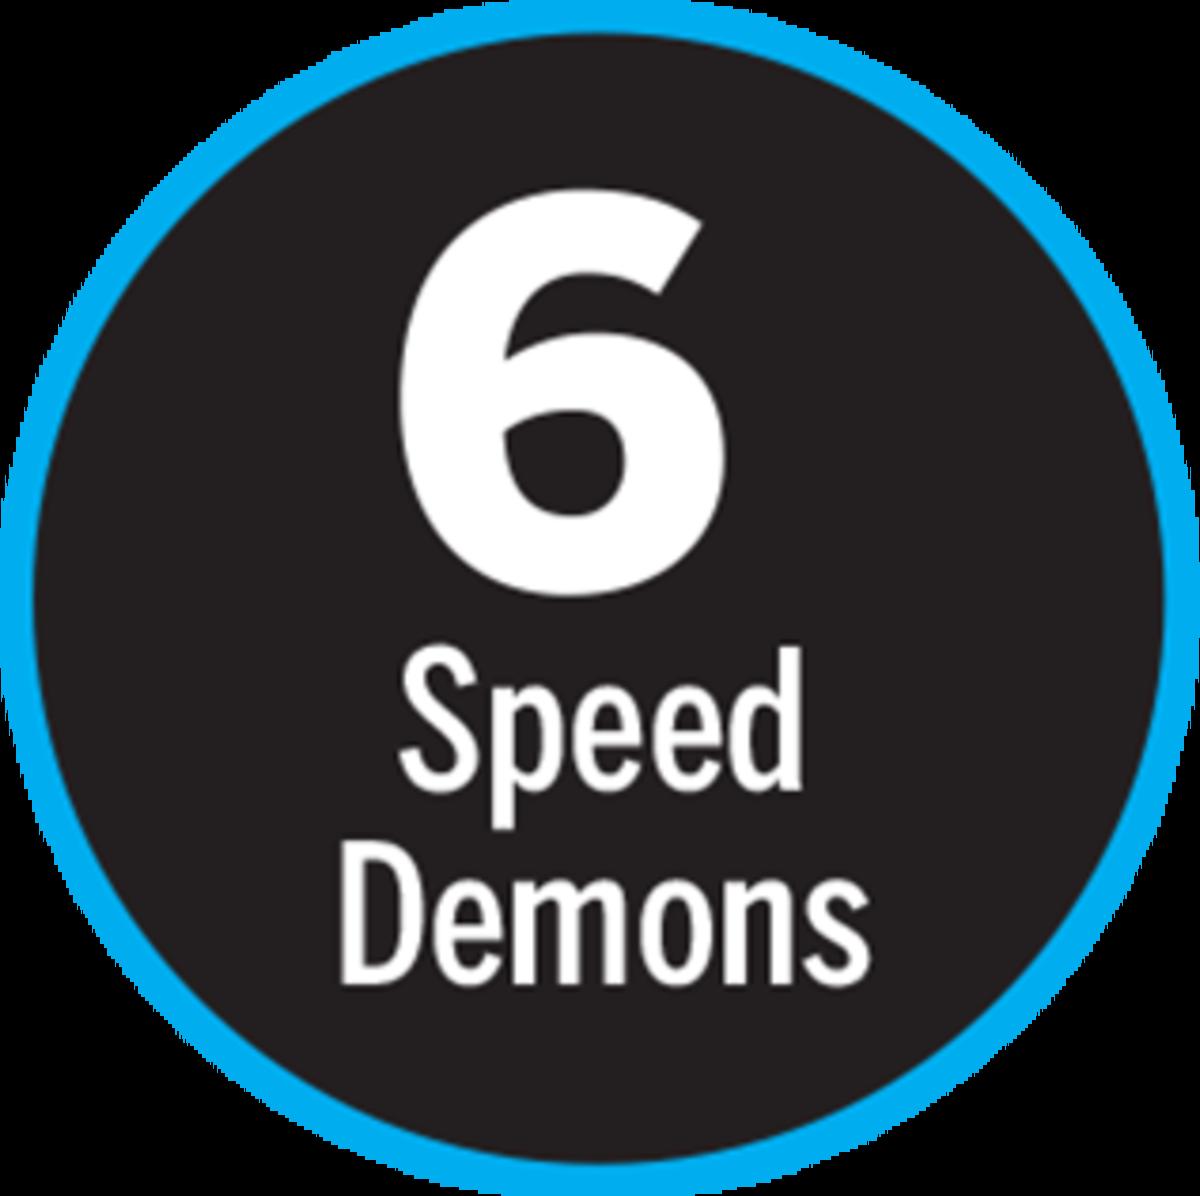 6-speed